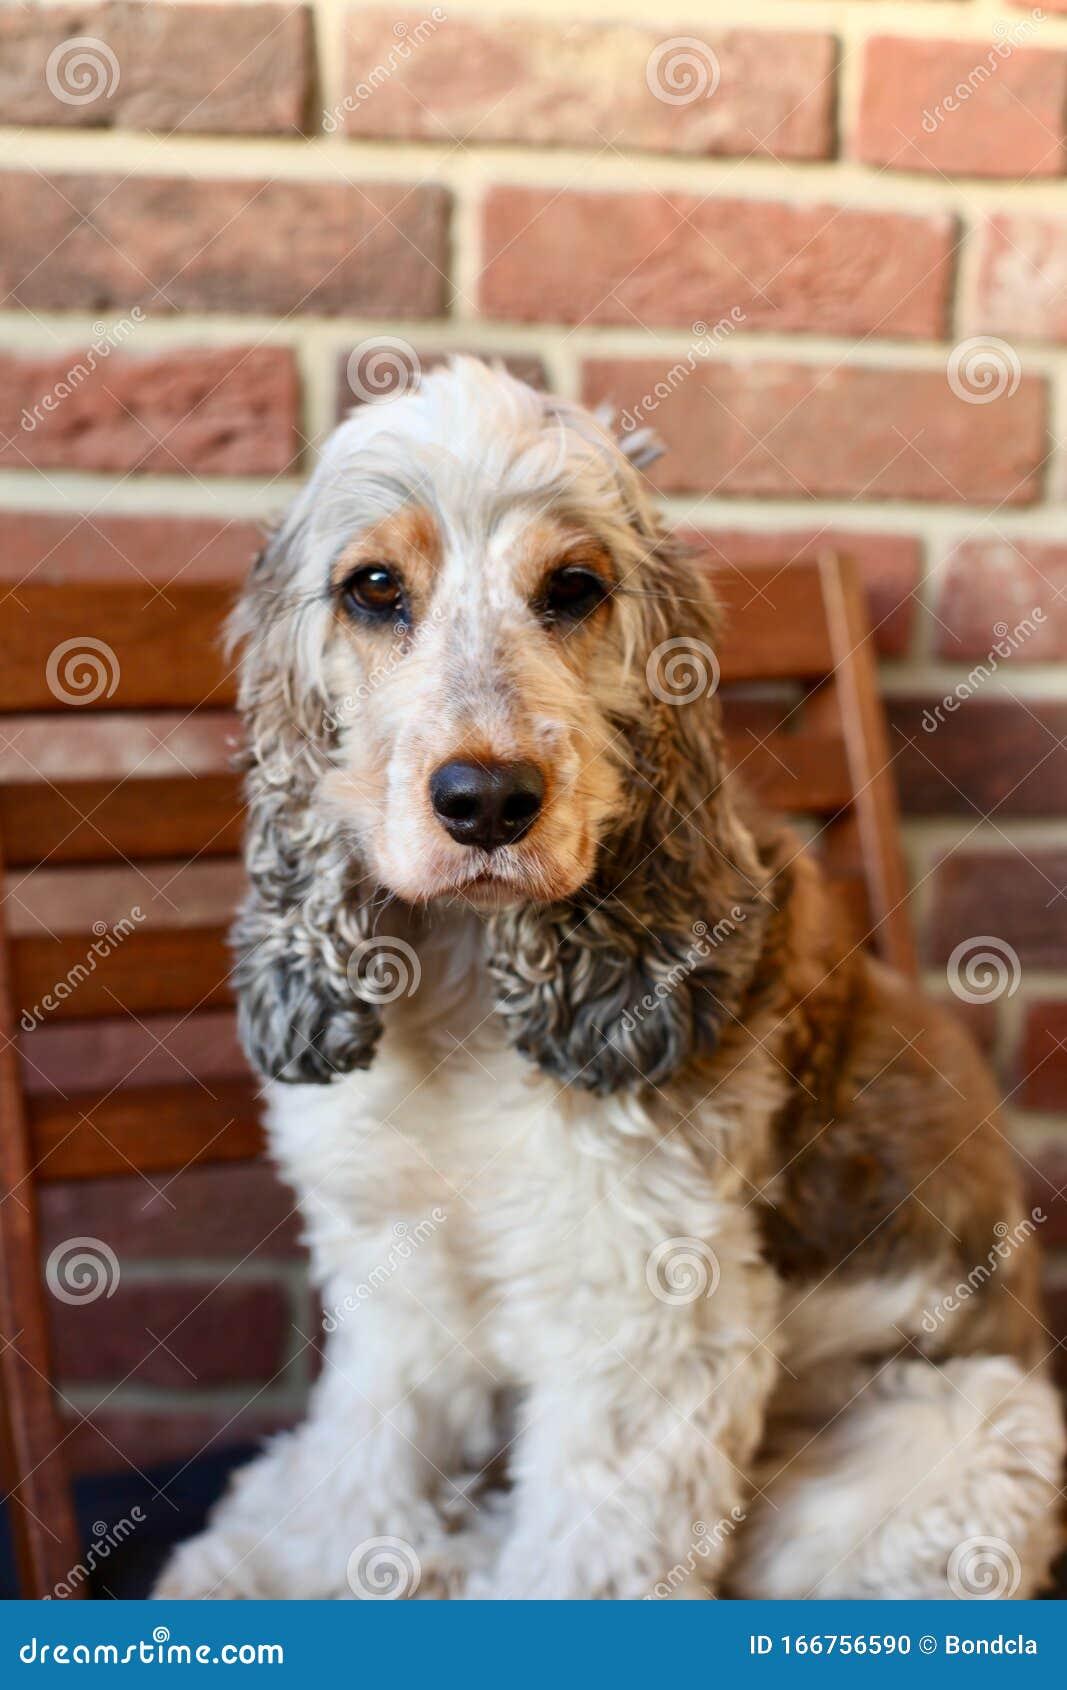 Adorable Cute Fluffy Sable Roan Cocker Spaniel Stock Photo Image Of Vera Remedy 166756590